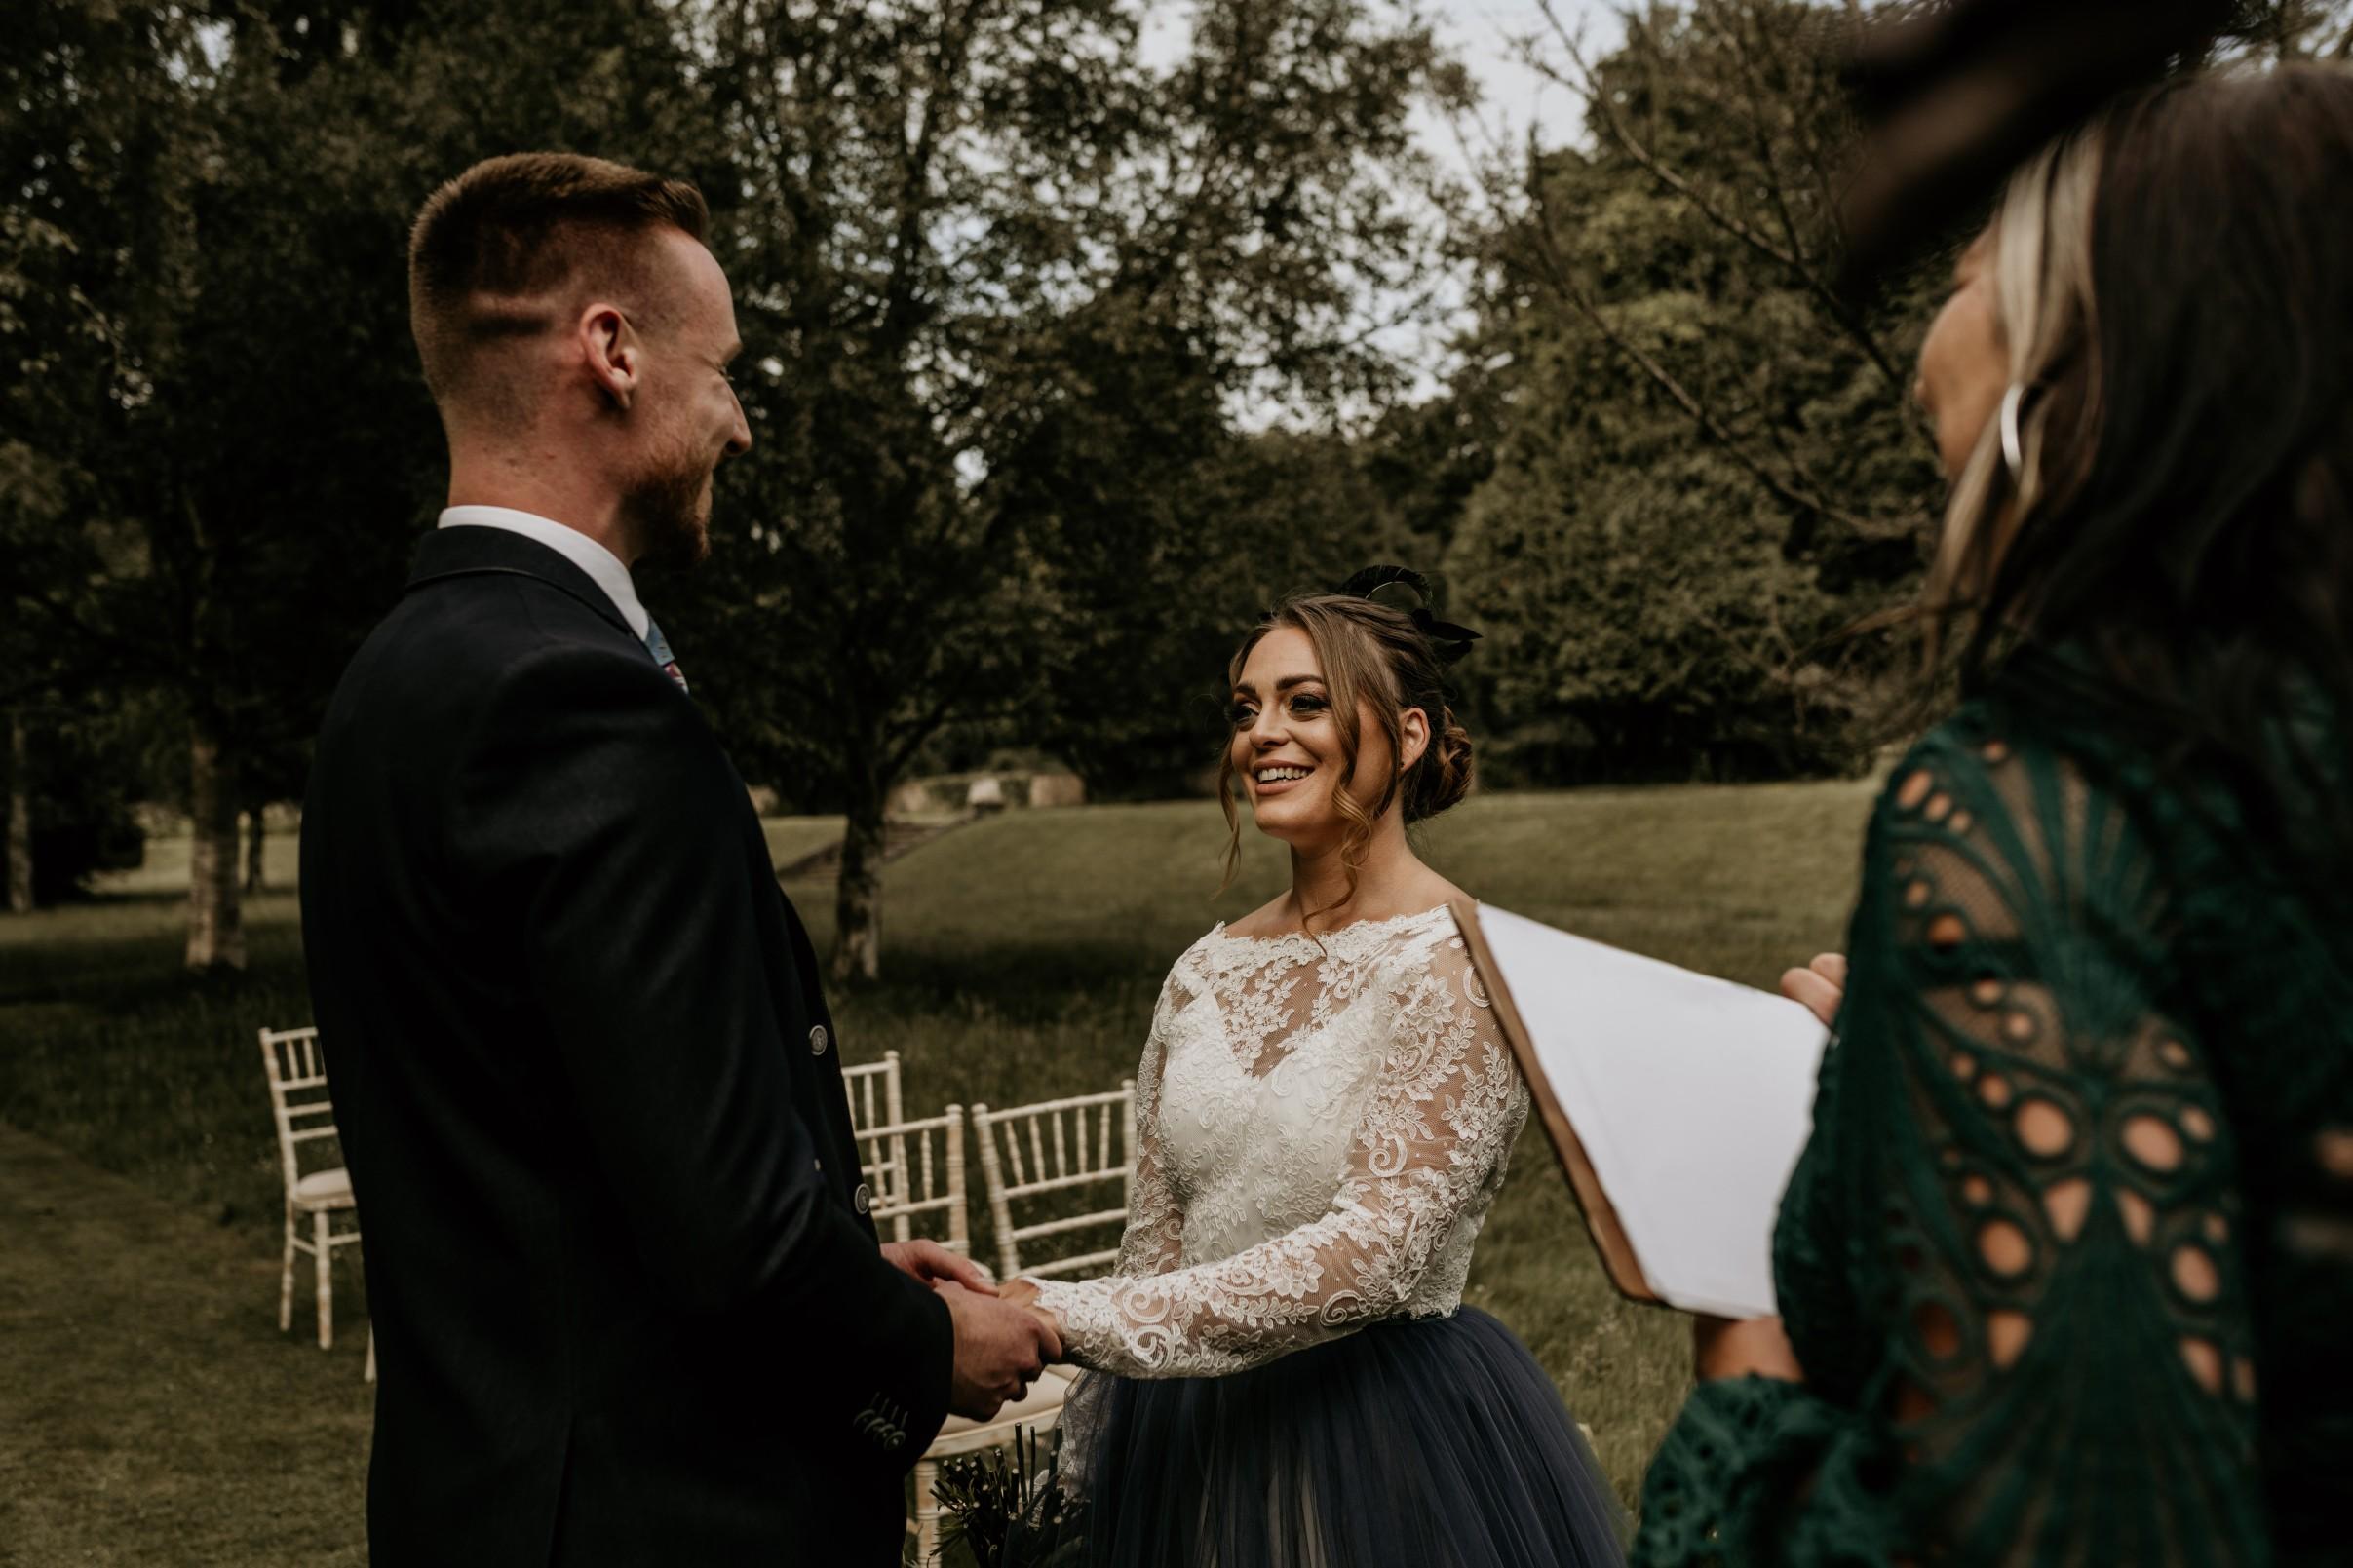 country garden wedding at newstead abbey - unique wedding ceremony - celebrant wedding ceremony - bohemian wedding ceremony - garden wedding ceremony vows